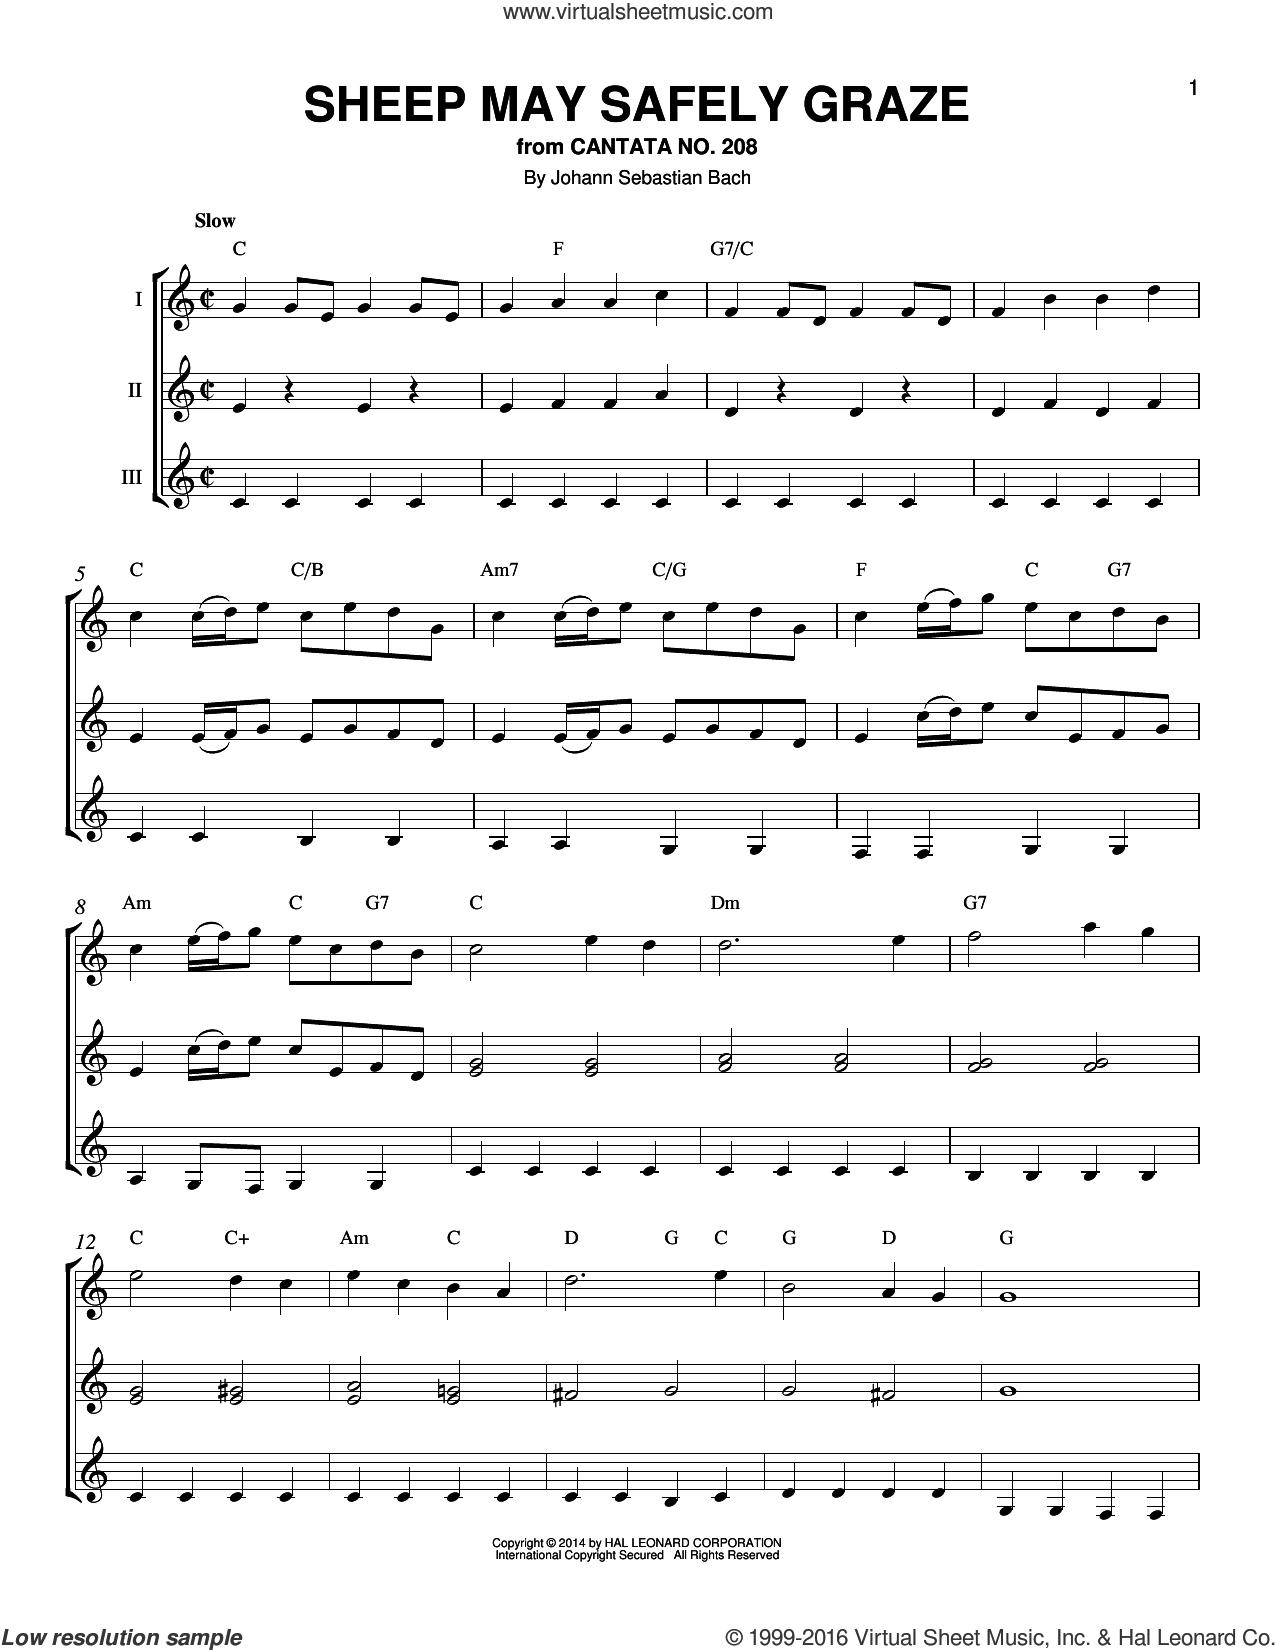 Sheep May Safely Graze sheet music for guitar ensemble by Johann Sebastian Bach, classical score, intermediate skill level